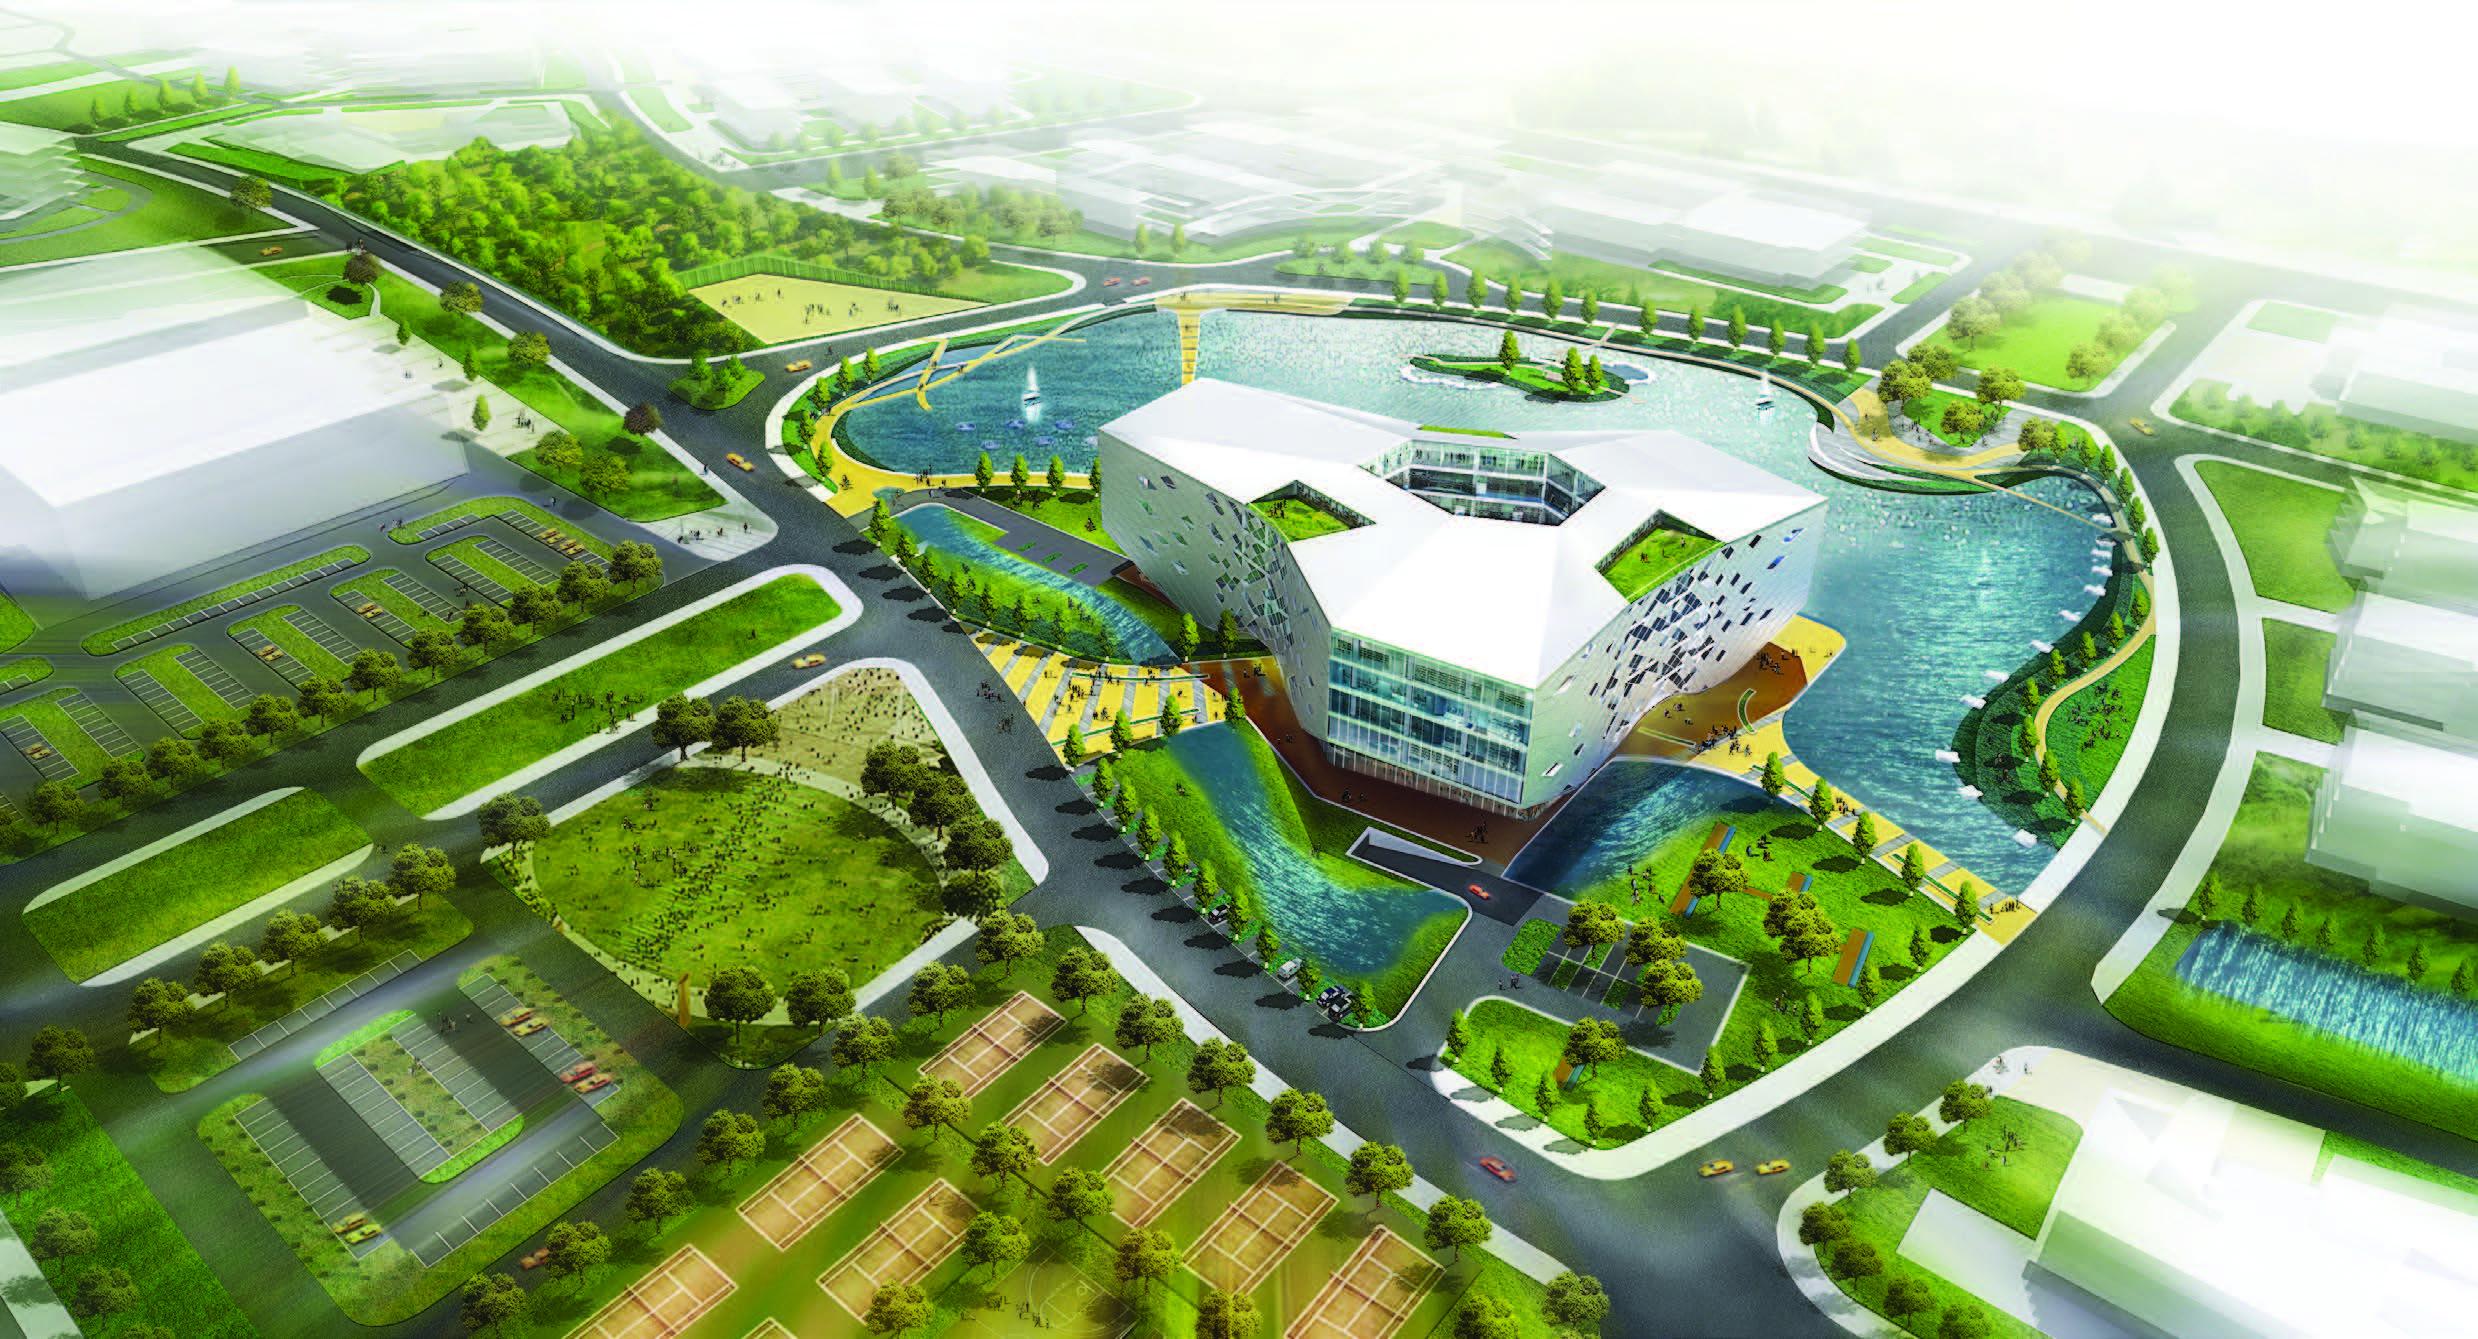 Biblioteca e Centro de Mídias da Universidade de Jiaxing / LYCS Architecture, Cortesia de LYCS Architecture